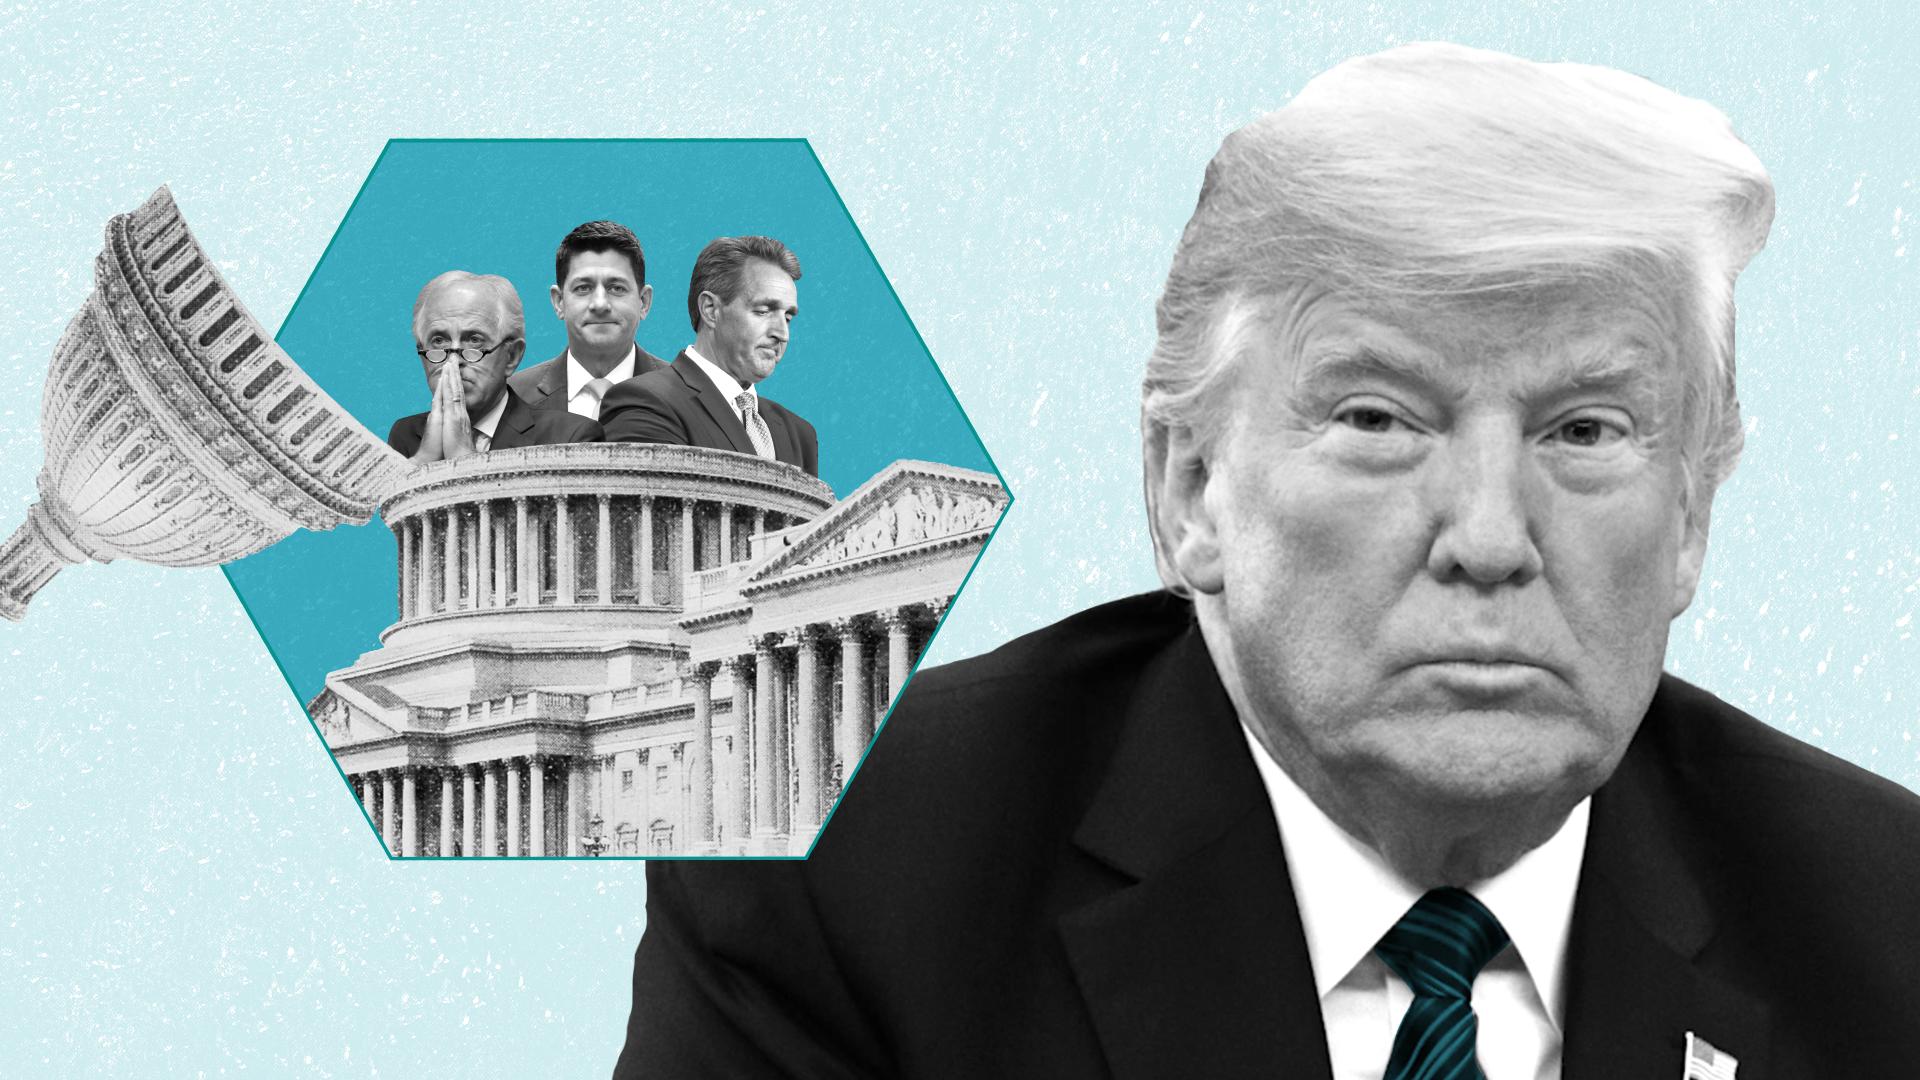 The shabbiest U.S. president ever is an inexpressibly sad specimen